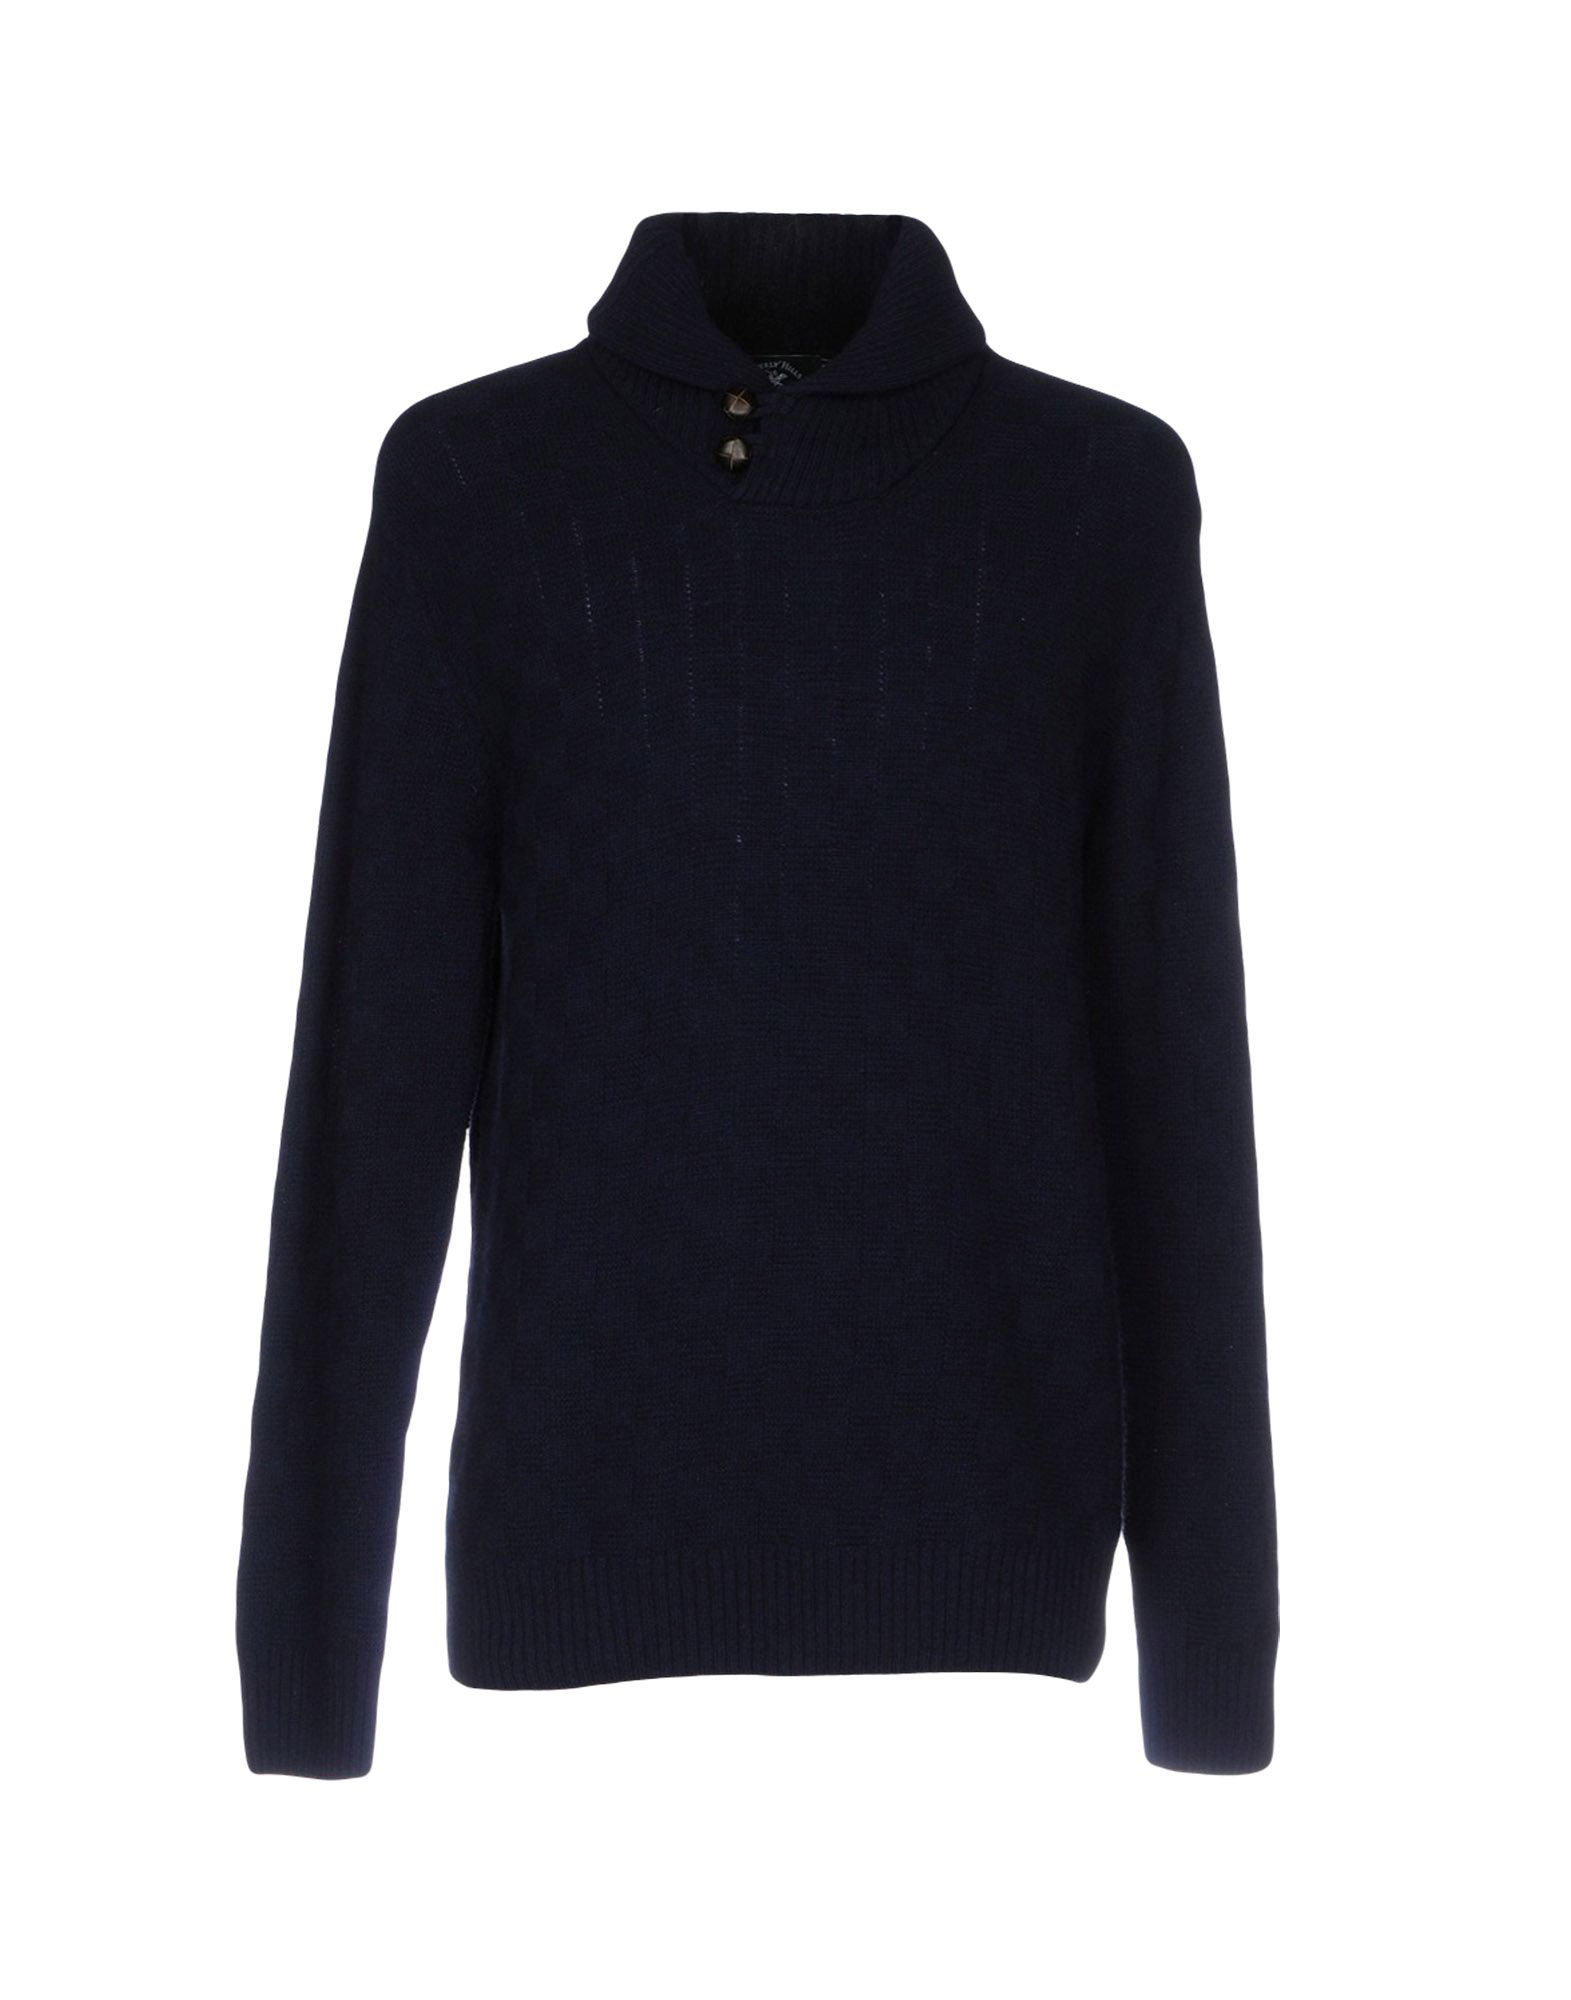 BEVERLY HILLS POLO CLUB Свитер свитер polo цвет черный